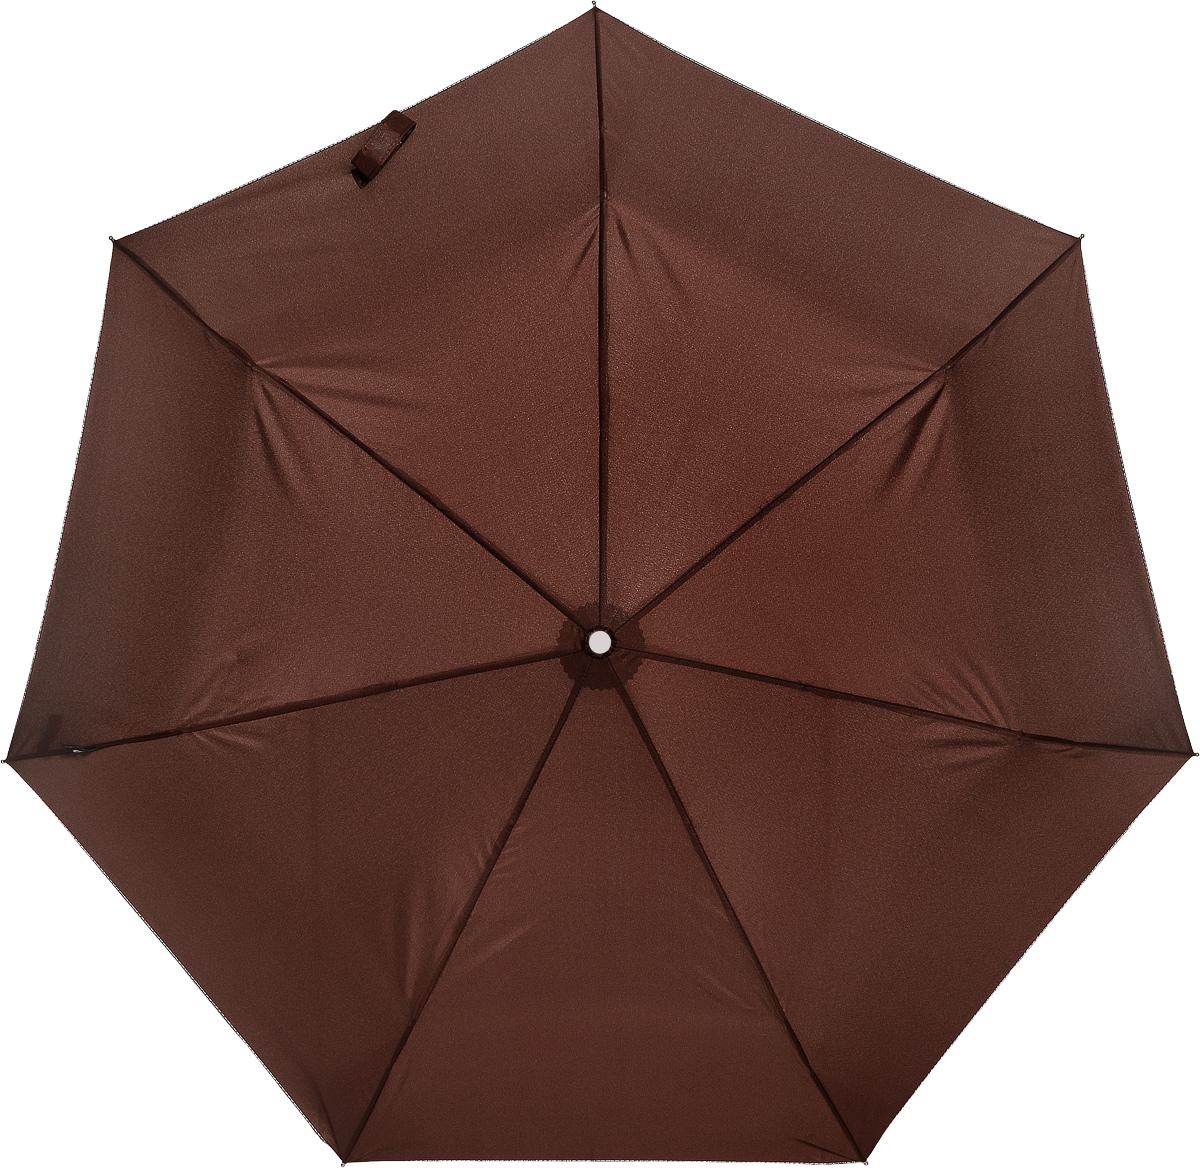 Bisetti 3580-5 Зонт полный автом. 3 сл. жен. зонты